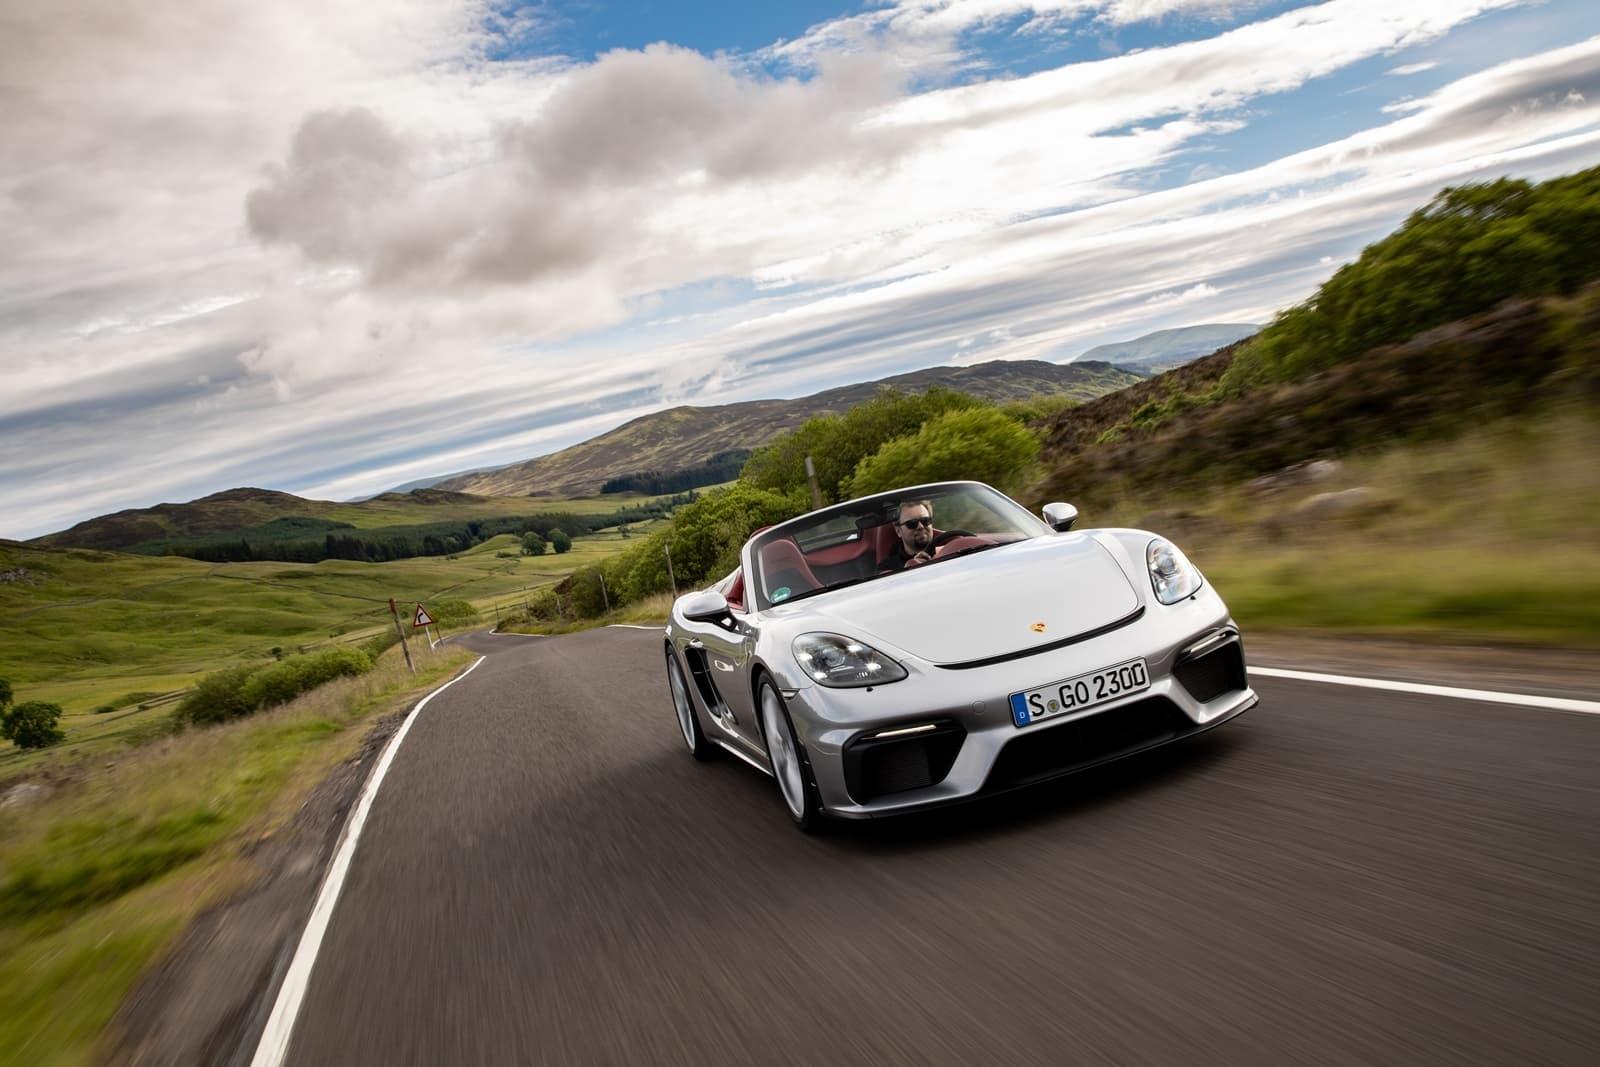 Porsche 718 Spyder 0719 016